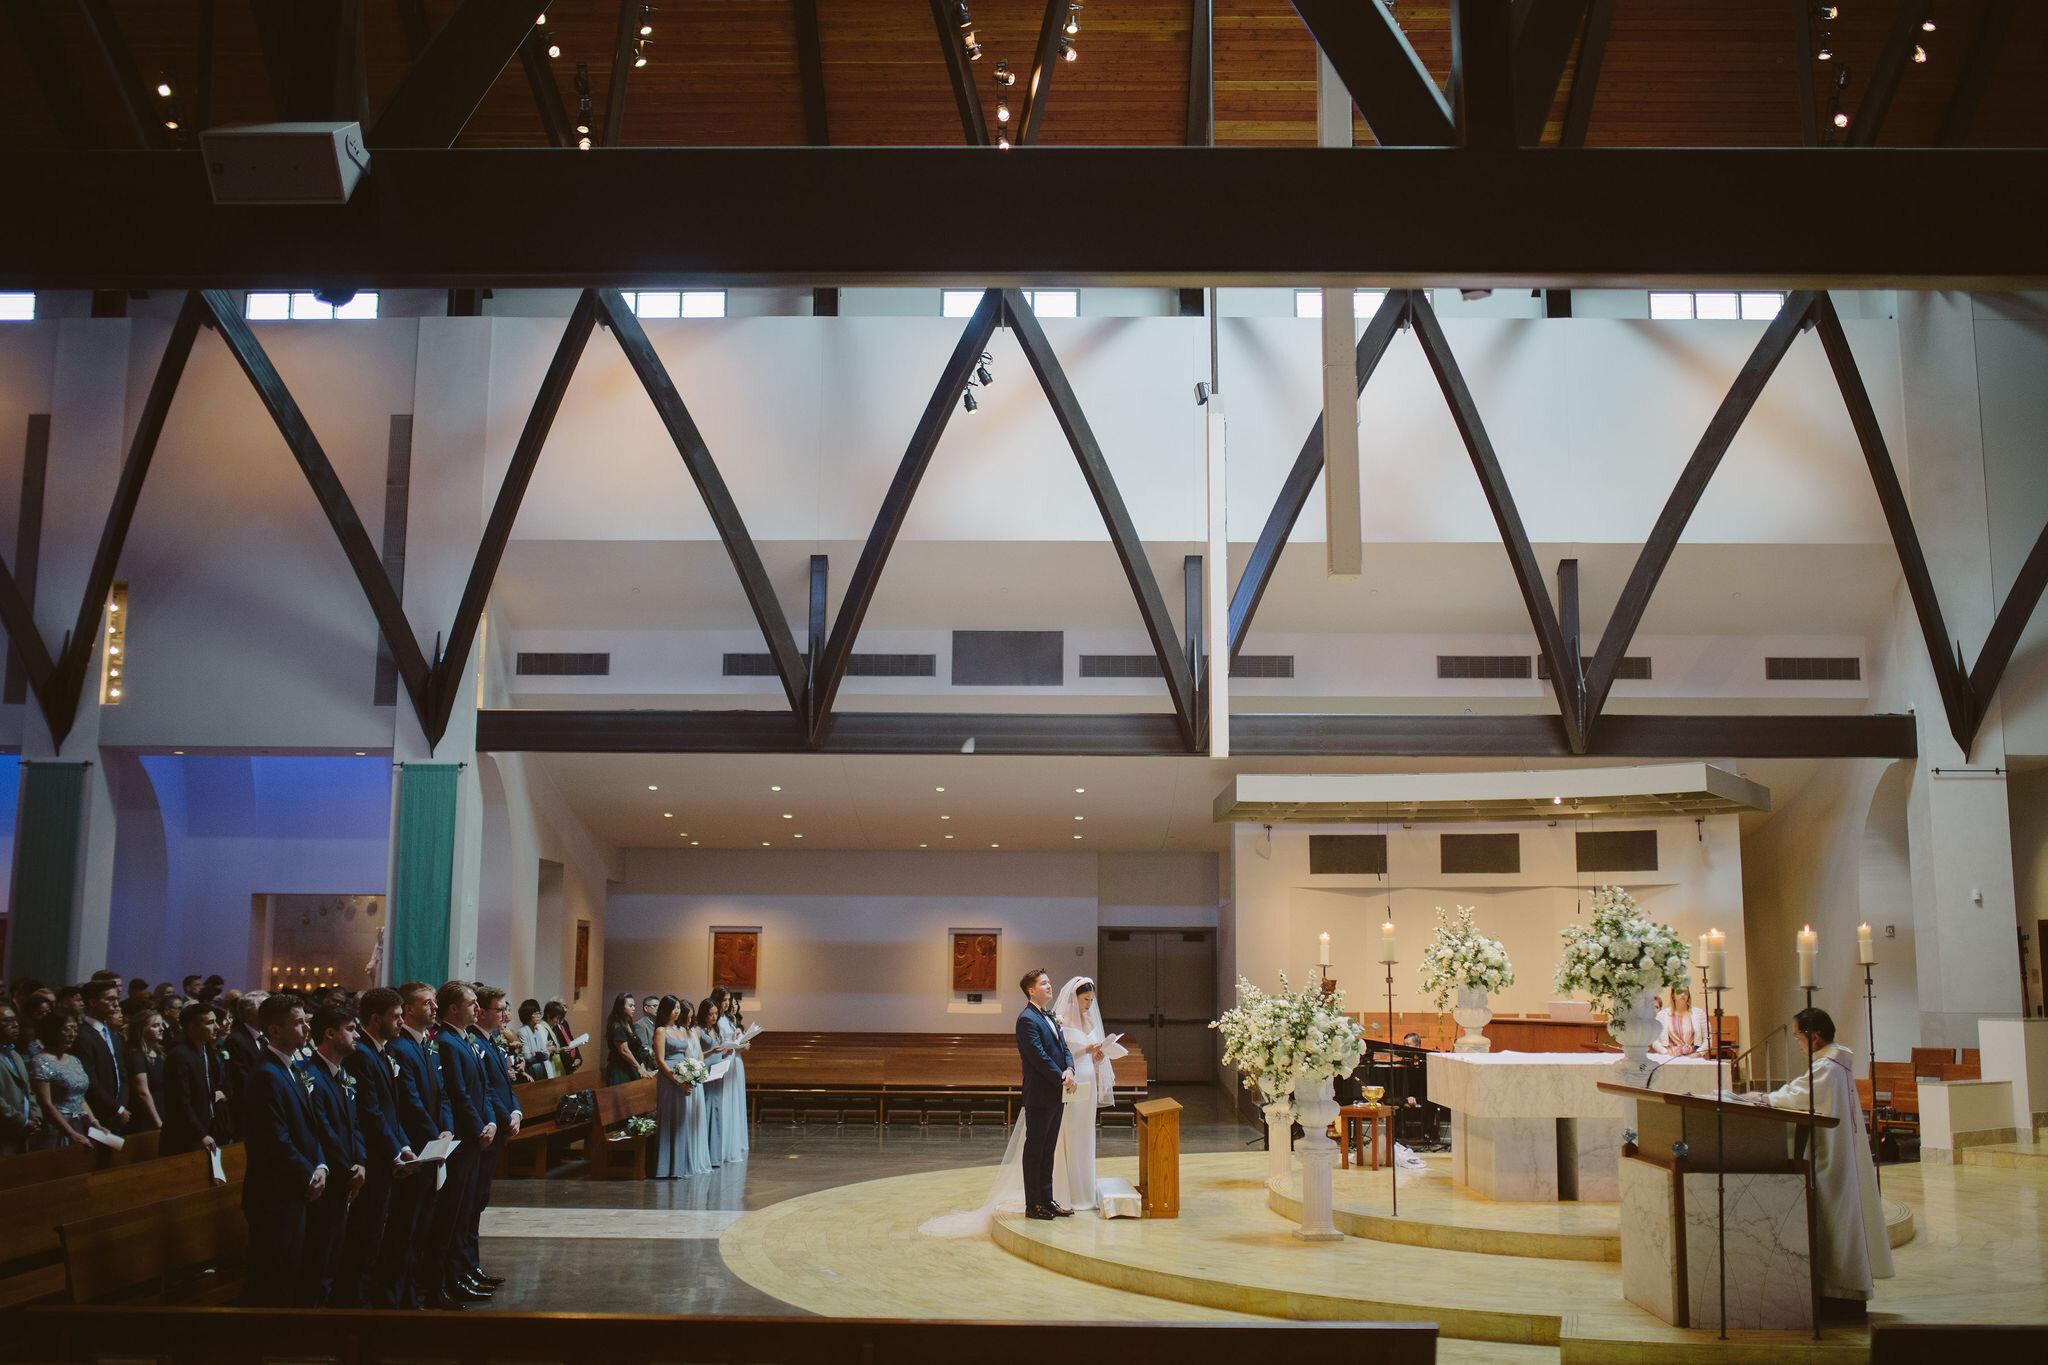 catholic-mass-ceremony-newport-beach